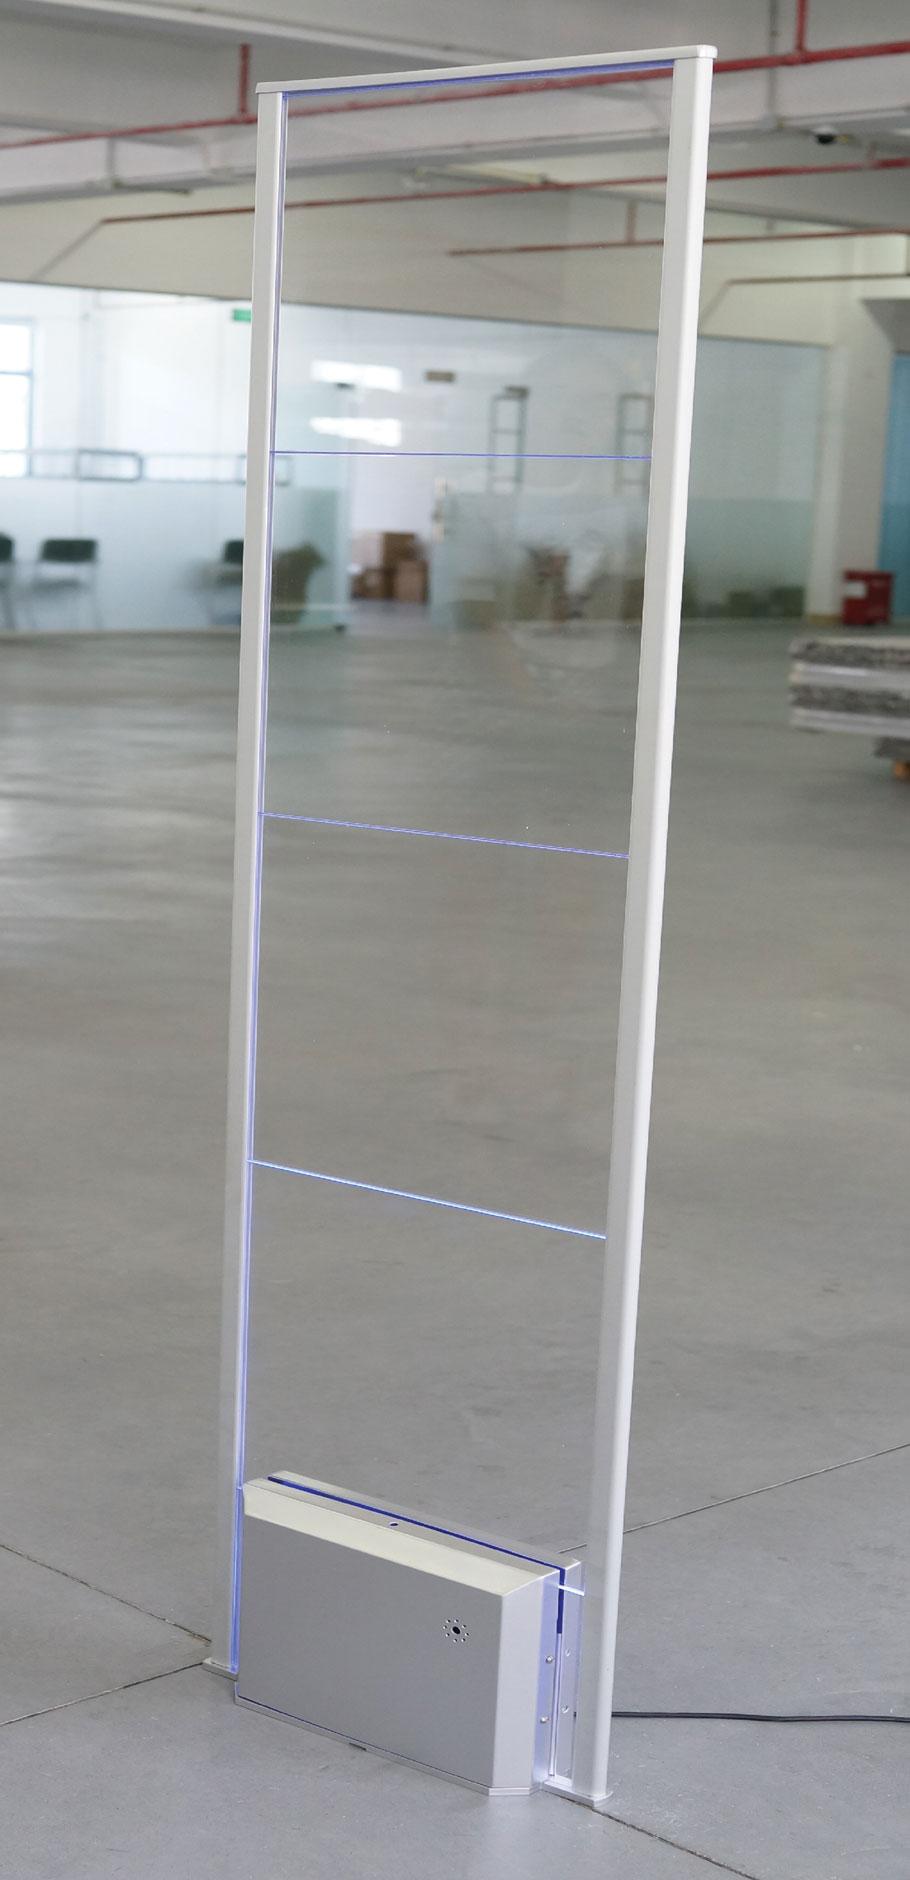 ảnh thực tế sản phẩm Foxcom EAS6005